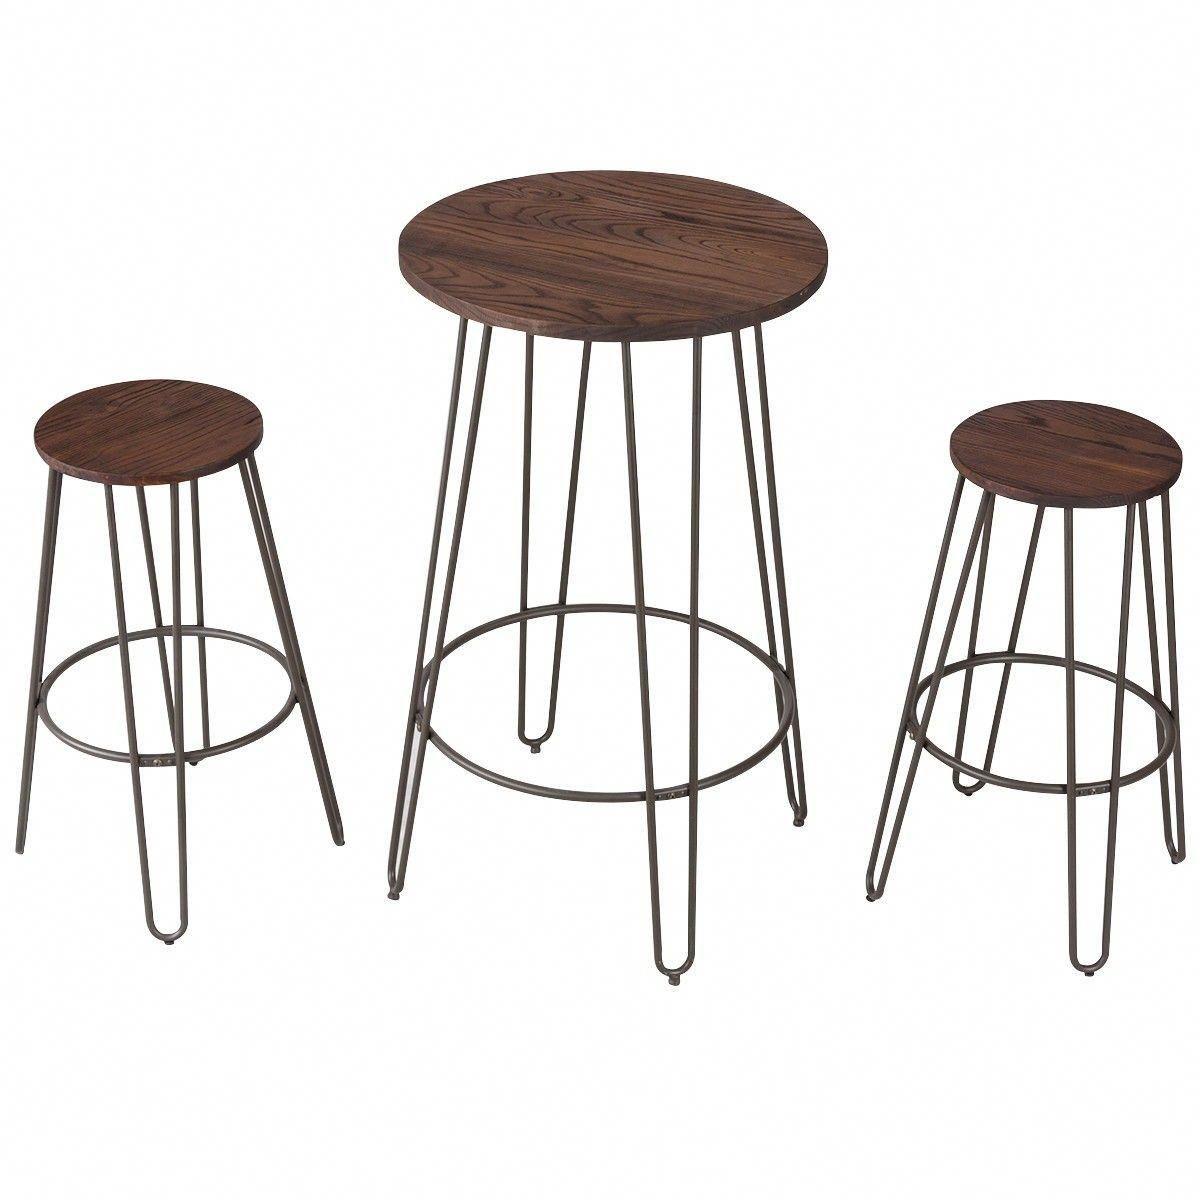 3 Pcs Wood Round Bar Table Bistro Stool Set Round Bar Table Bar